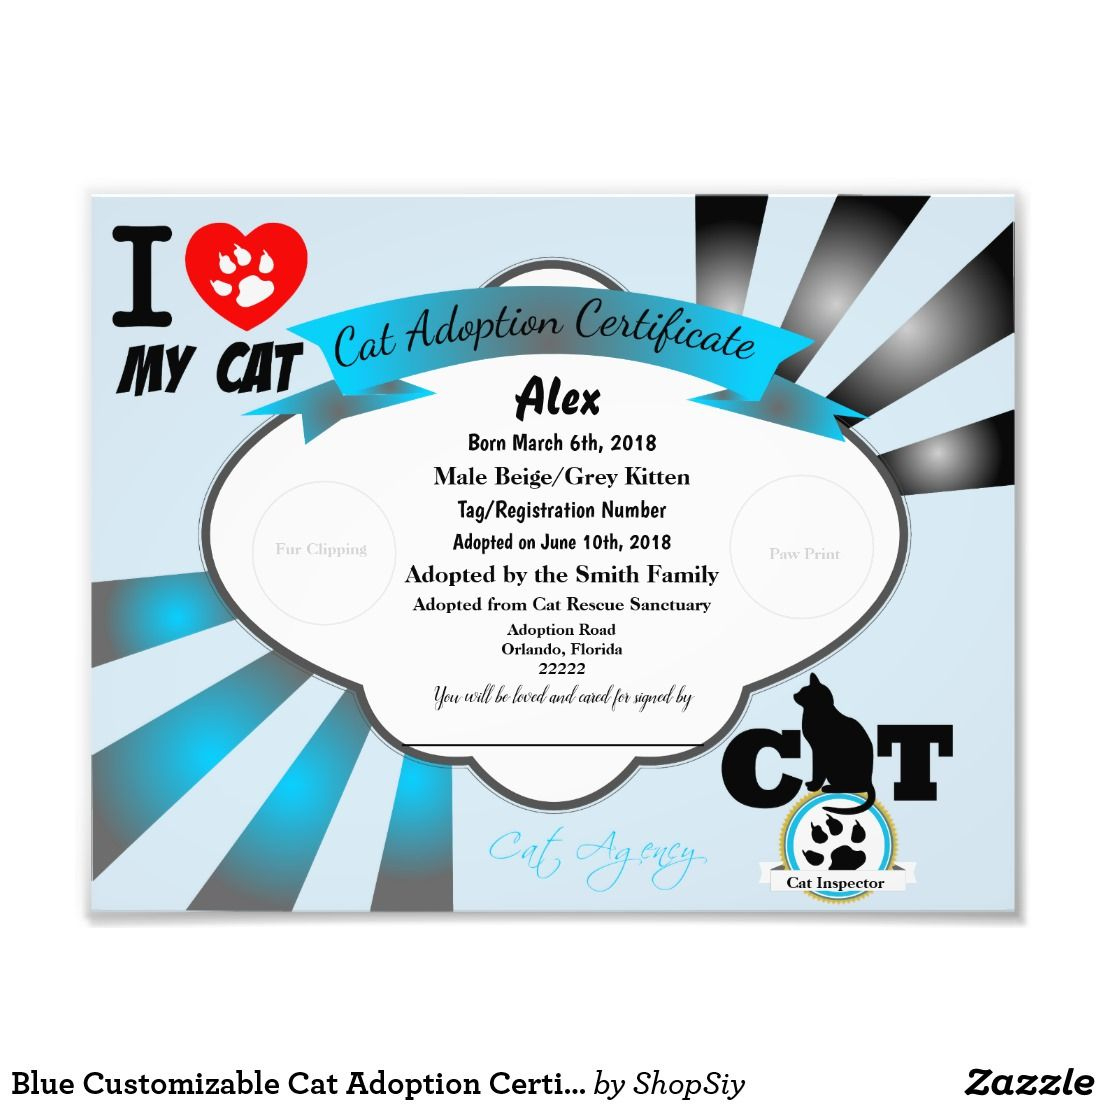 Blue Customizable Cat Adoption Certificate Photo Print in Amazing Cat Birth Certificate Free Printable